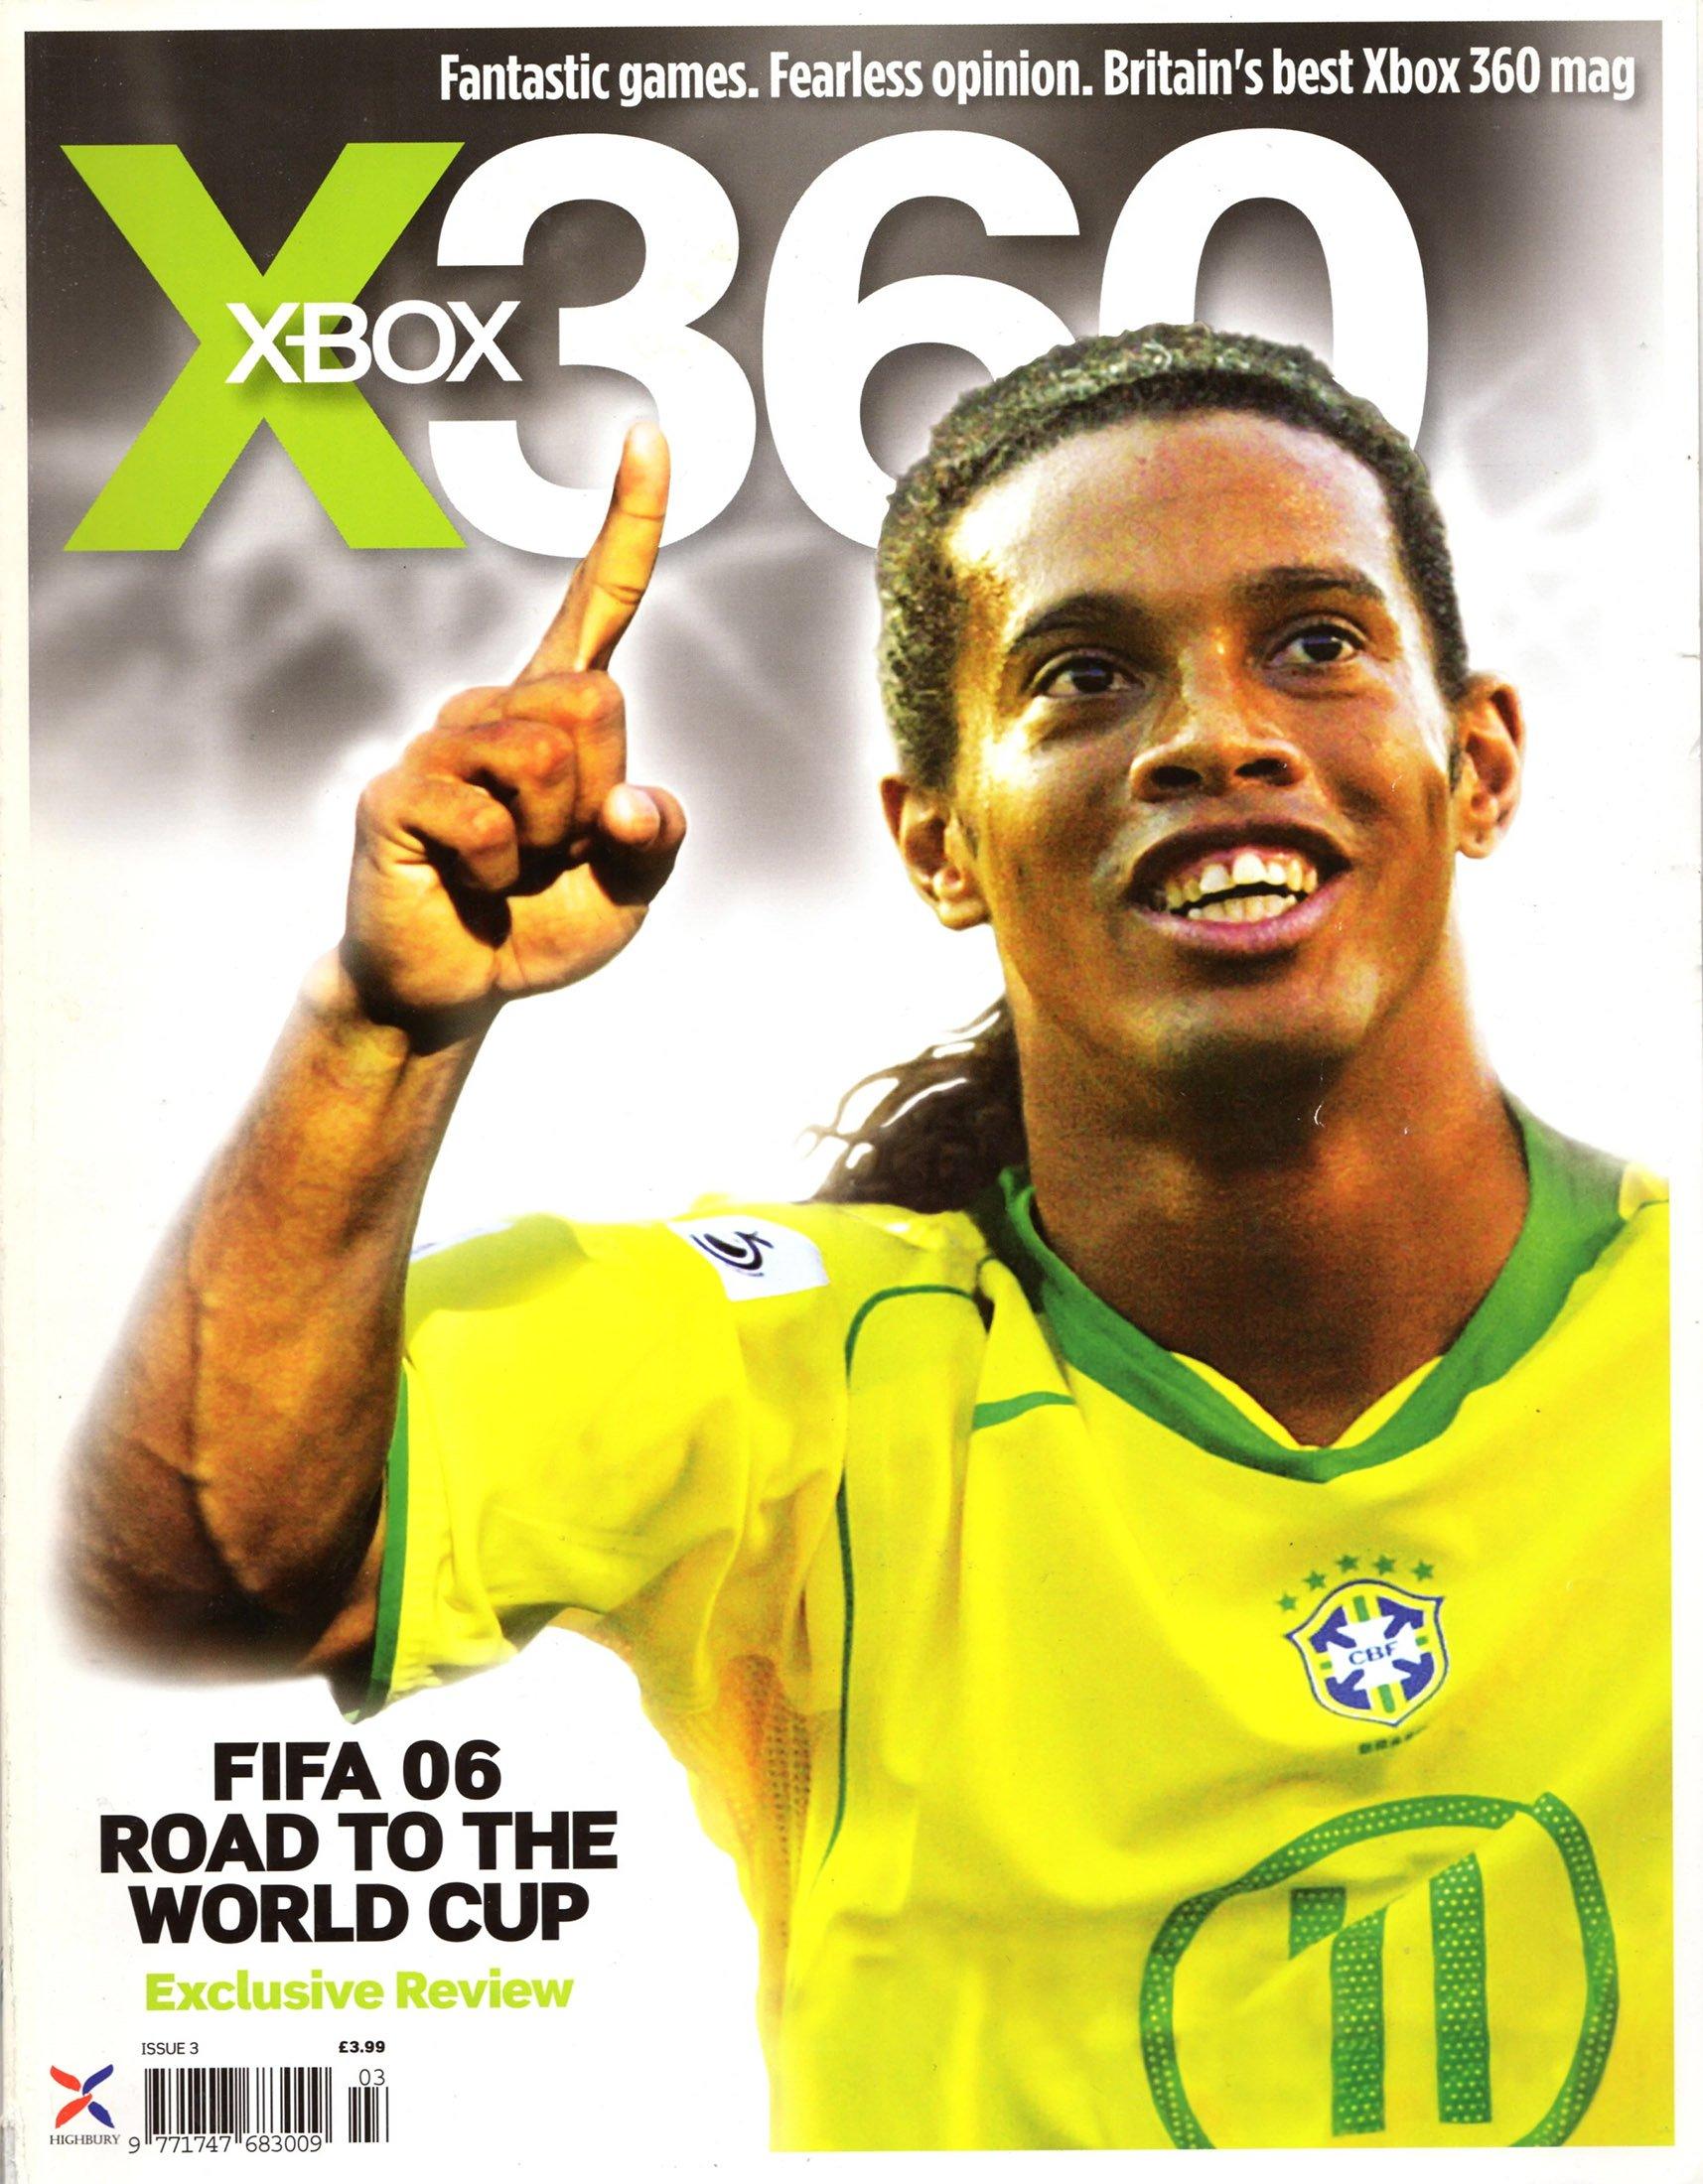 X360 Issue 003 (November 2005)